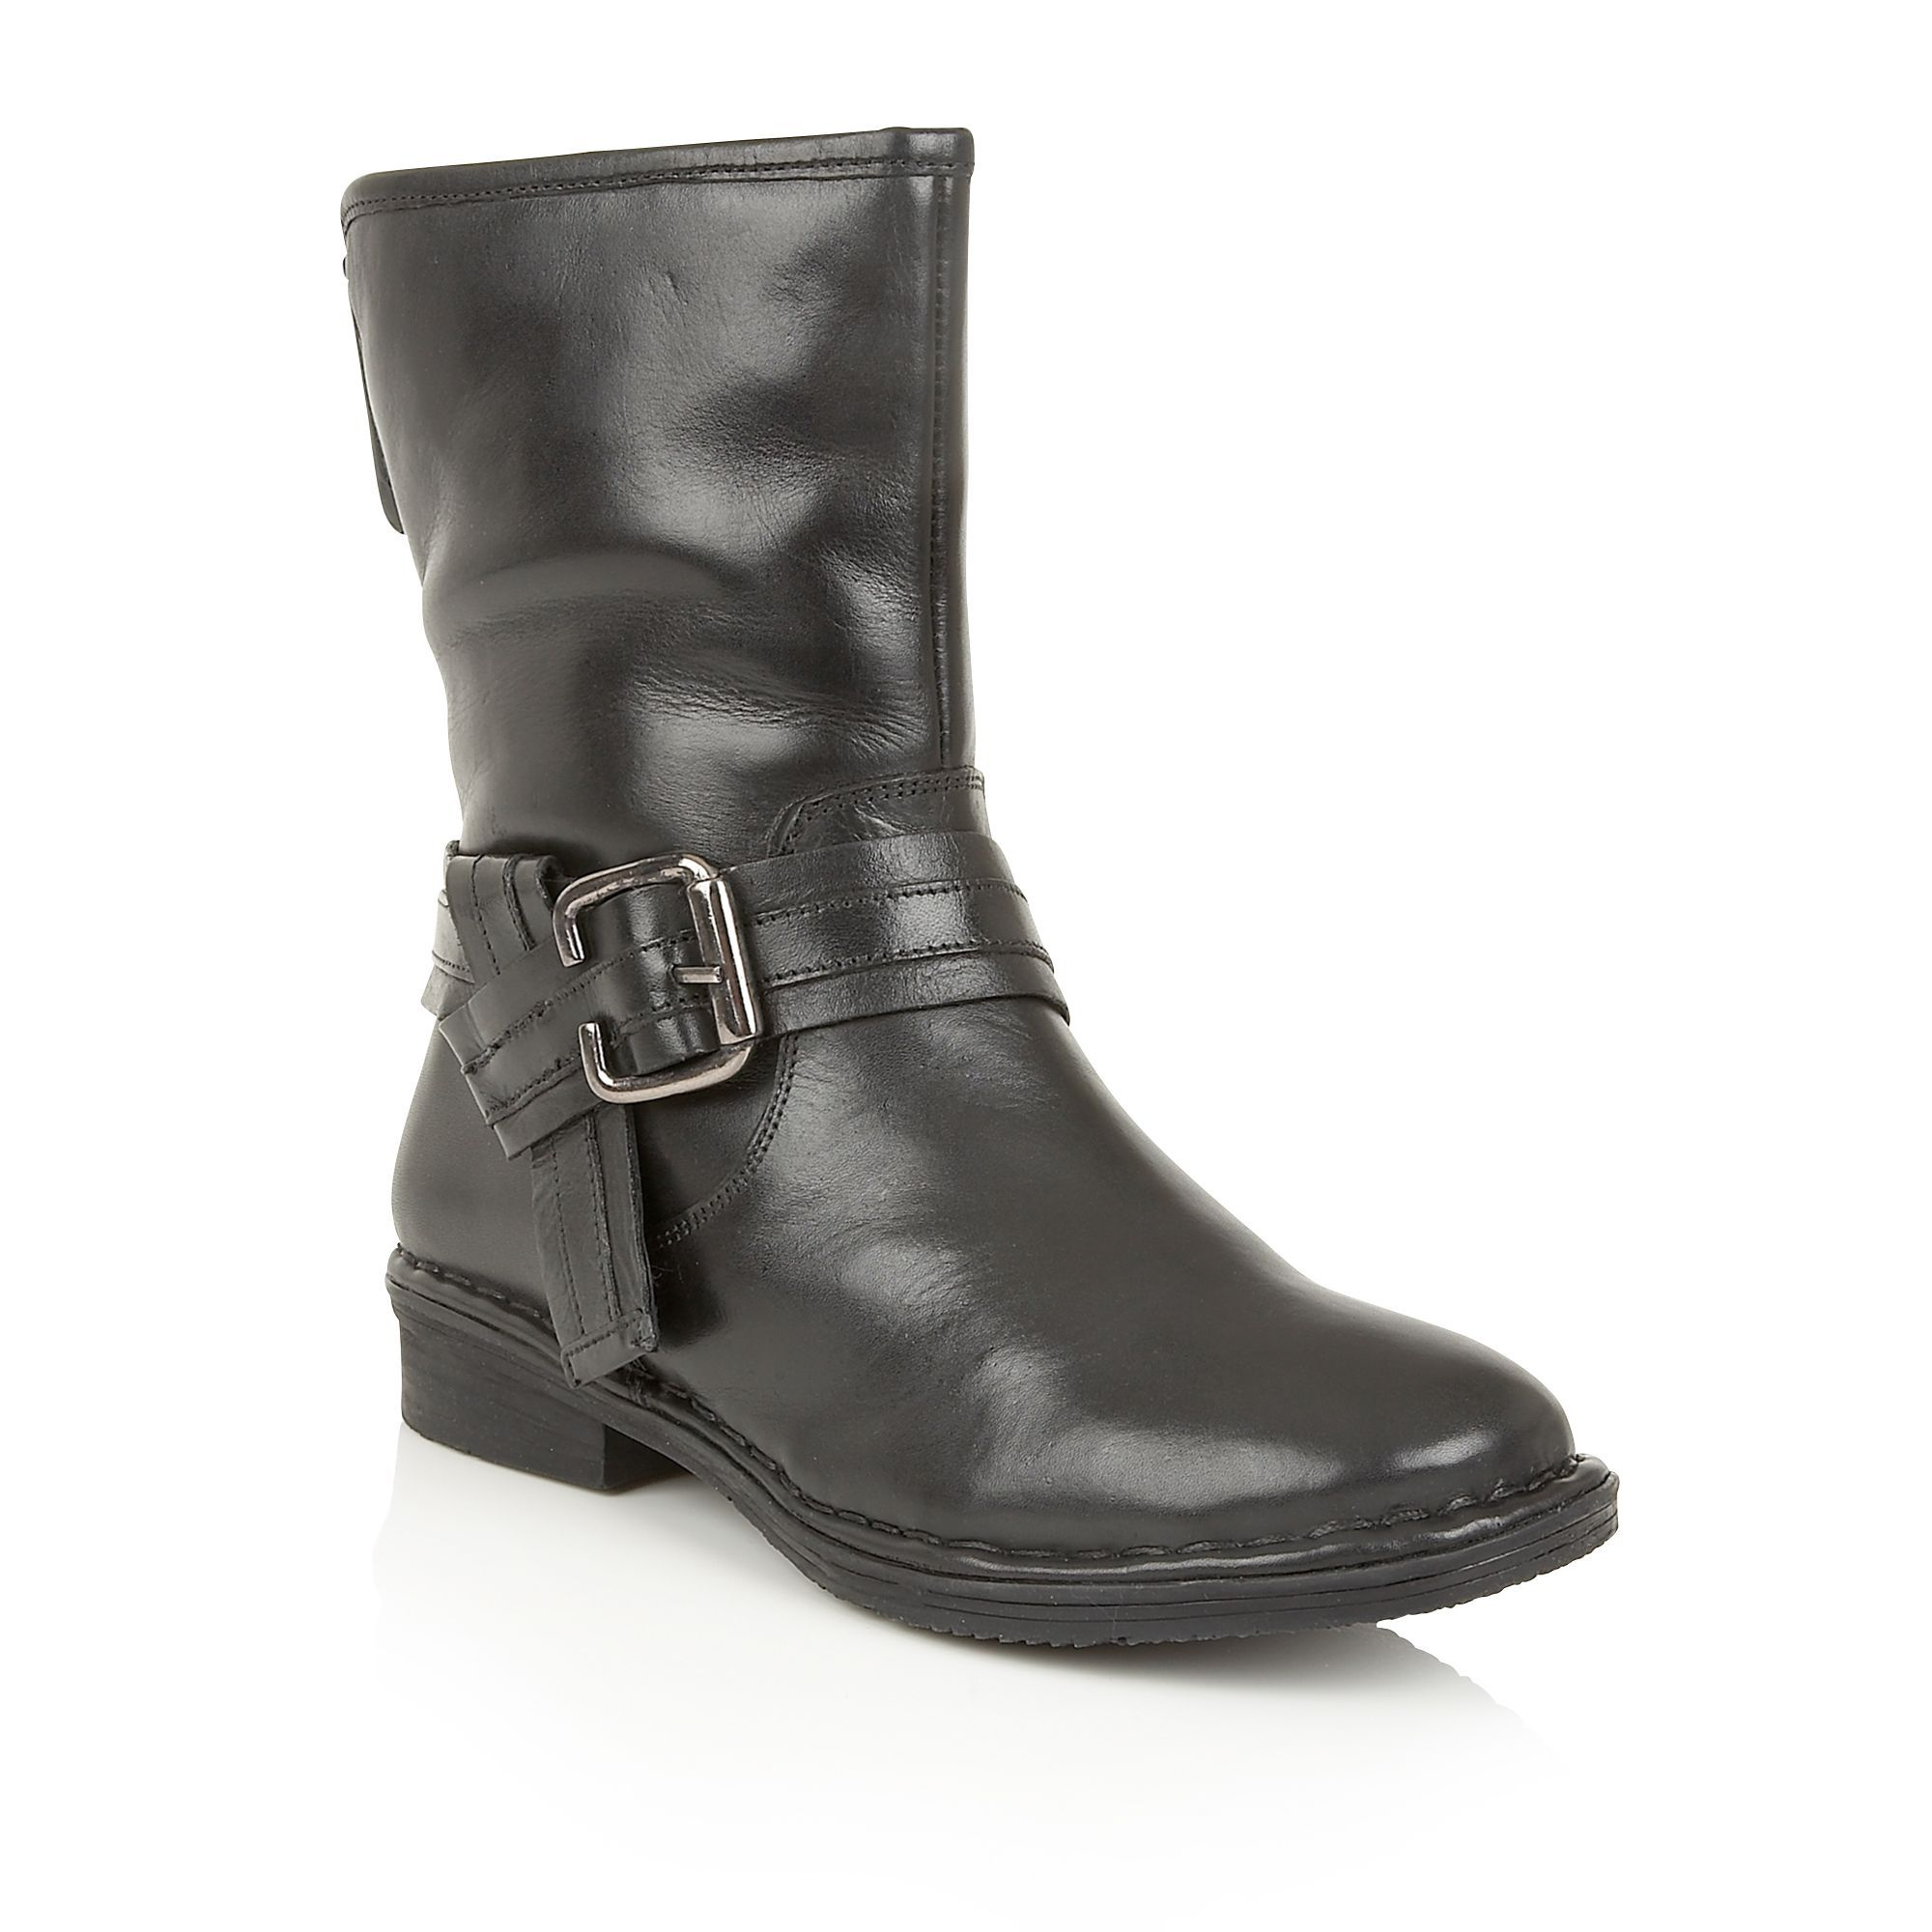 Marta Jonsson Womens High Heeled Lace Up Shoe 4740L Women's